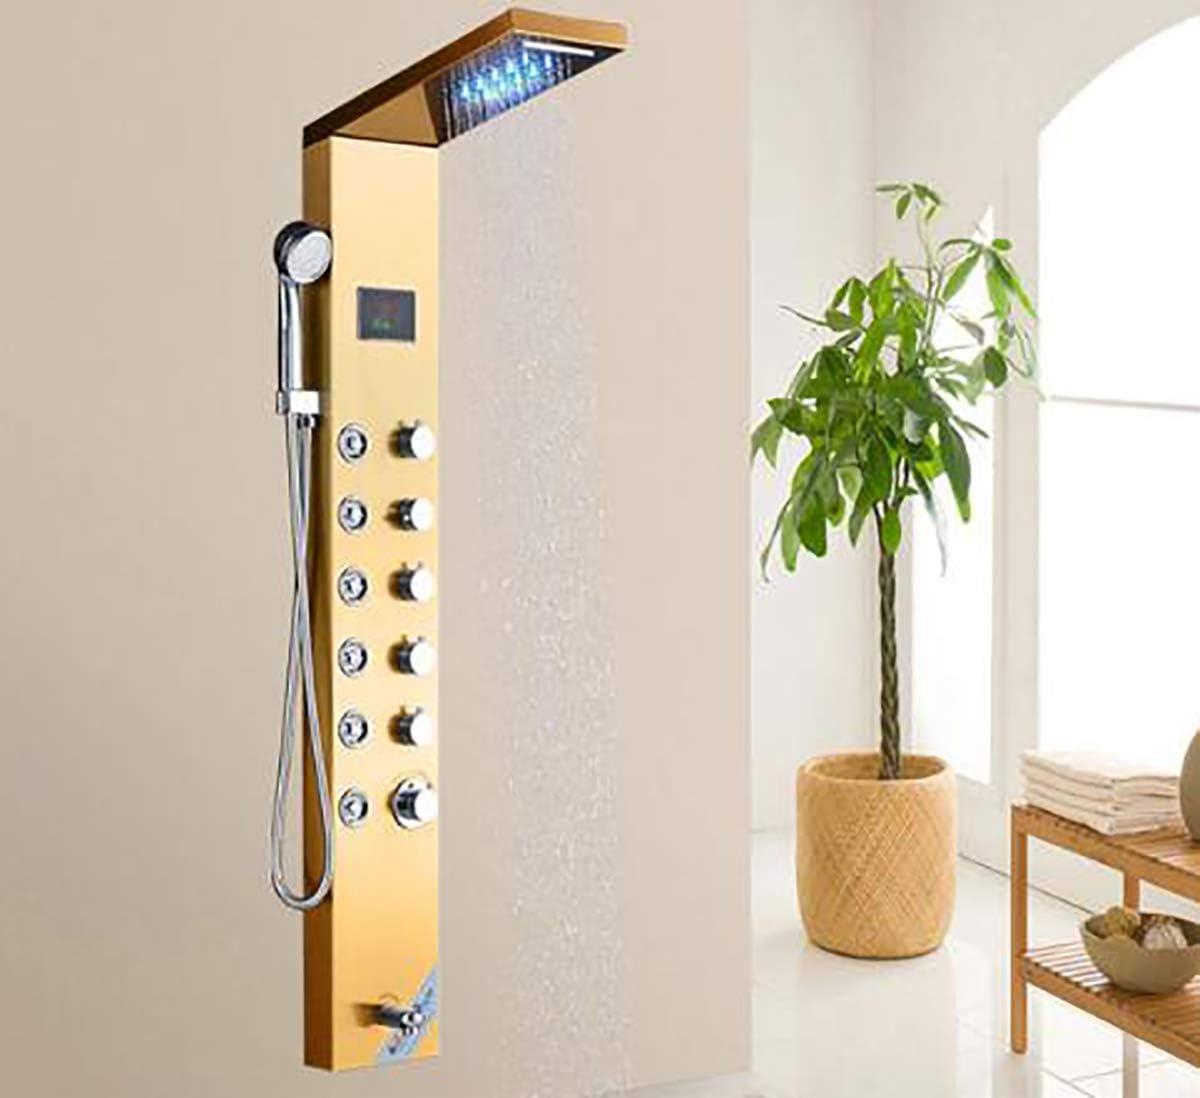 Shower system Columna de Ducha Grifo con luz Led Baño Baño Sistema ...